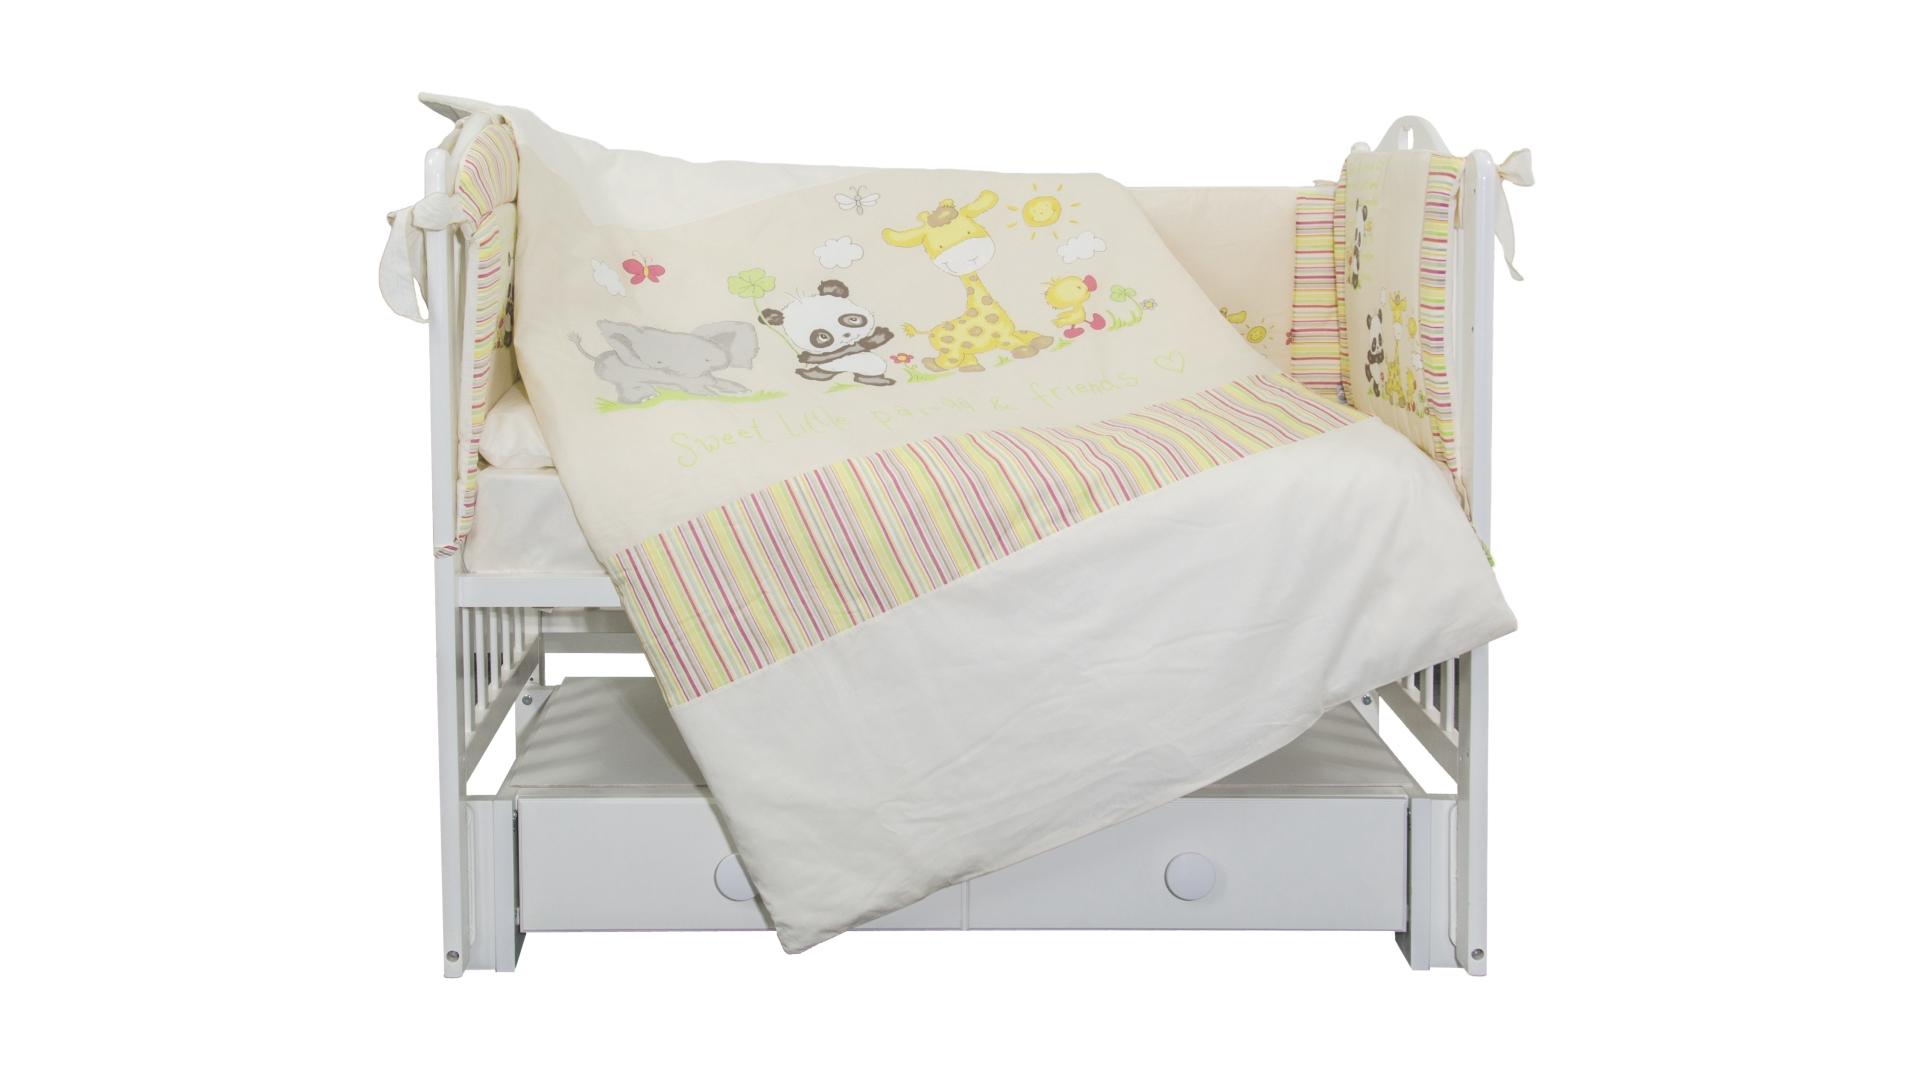 Комплект в кроватку Панда с друзьями (6) фото FullHD (0)